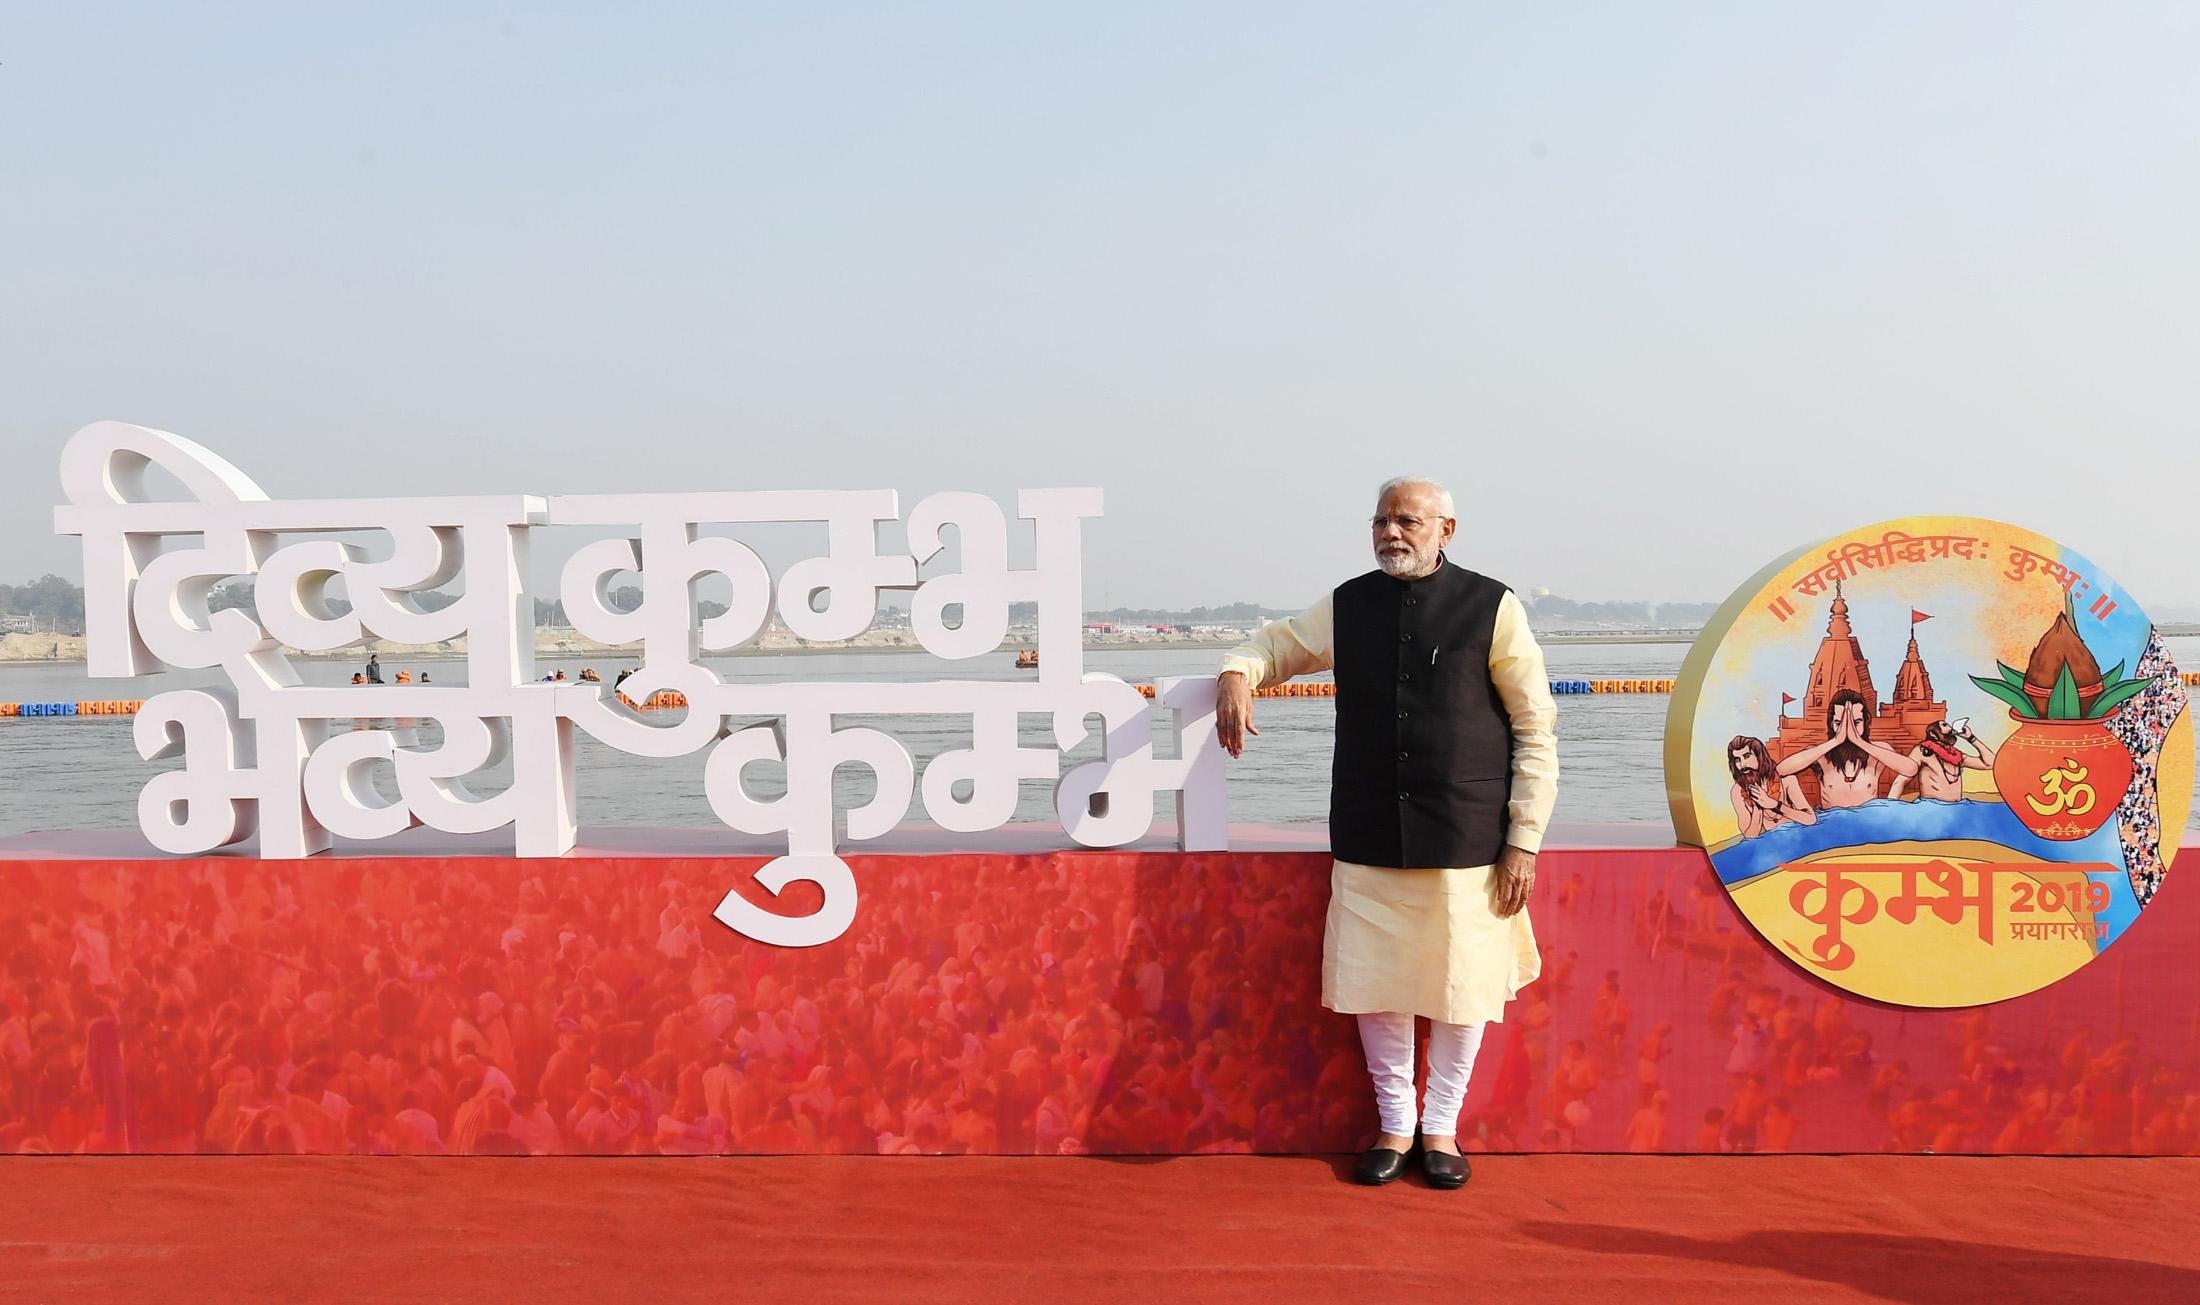 Prime Minister Narendra Modi at a 'Divya Kumbh Bhavya Kumbh' Selfie Point, in Prayagraj, Uttar Pradesh. (Photo courtesy: PMO